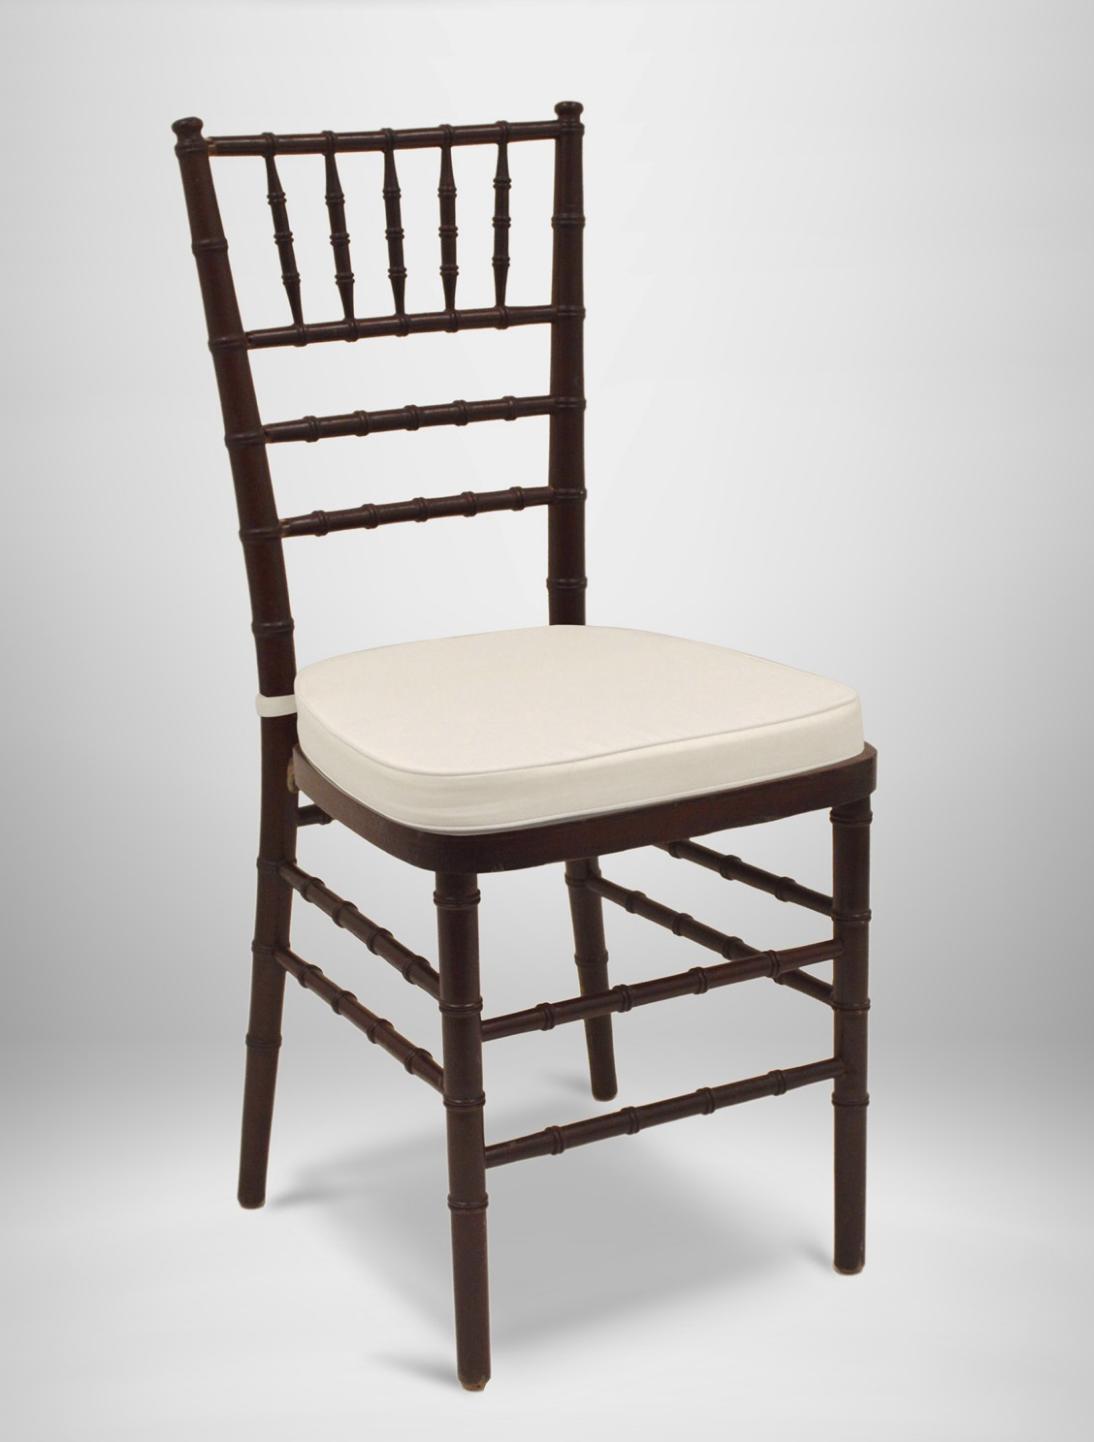 Fruitwood Chiavari Chairs with Pads